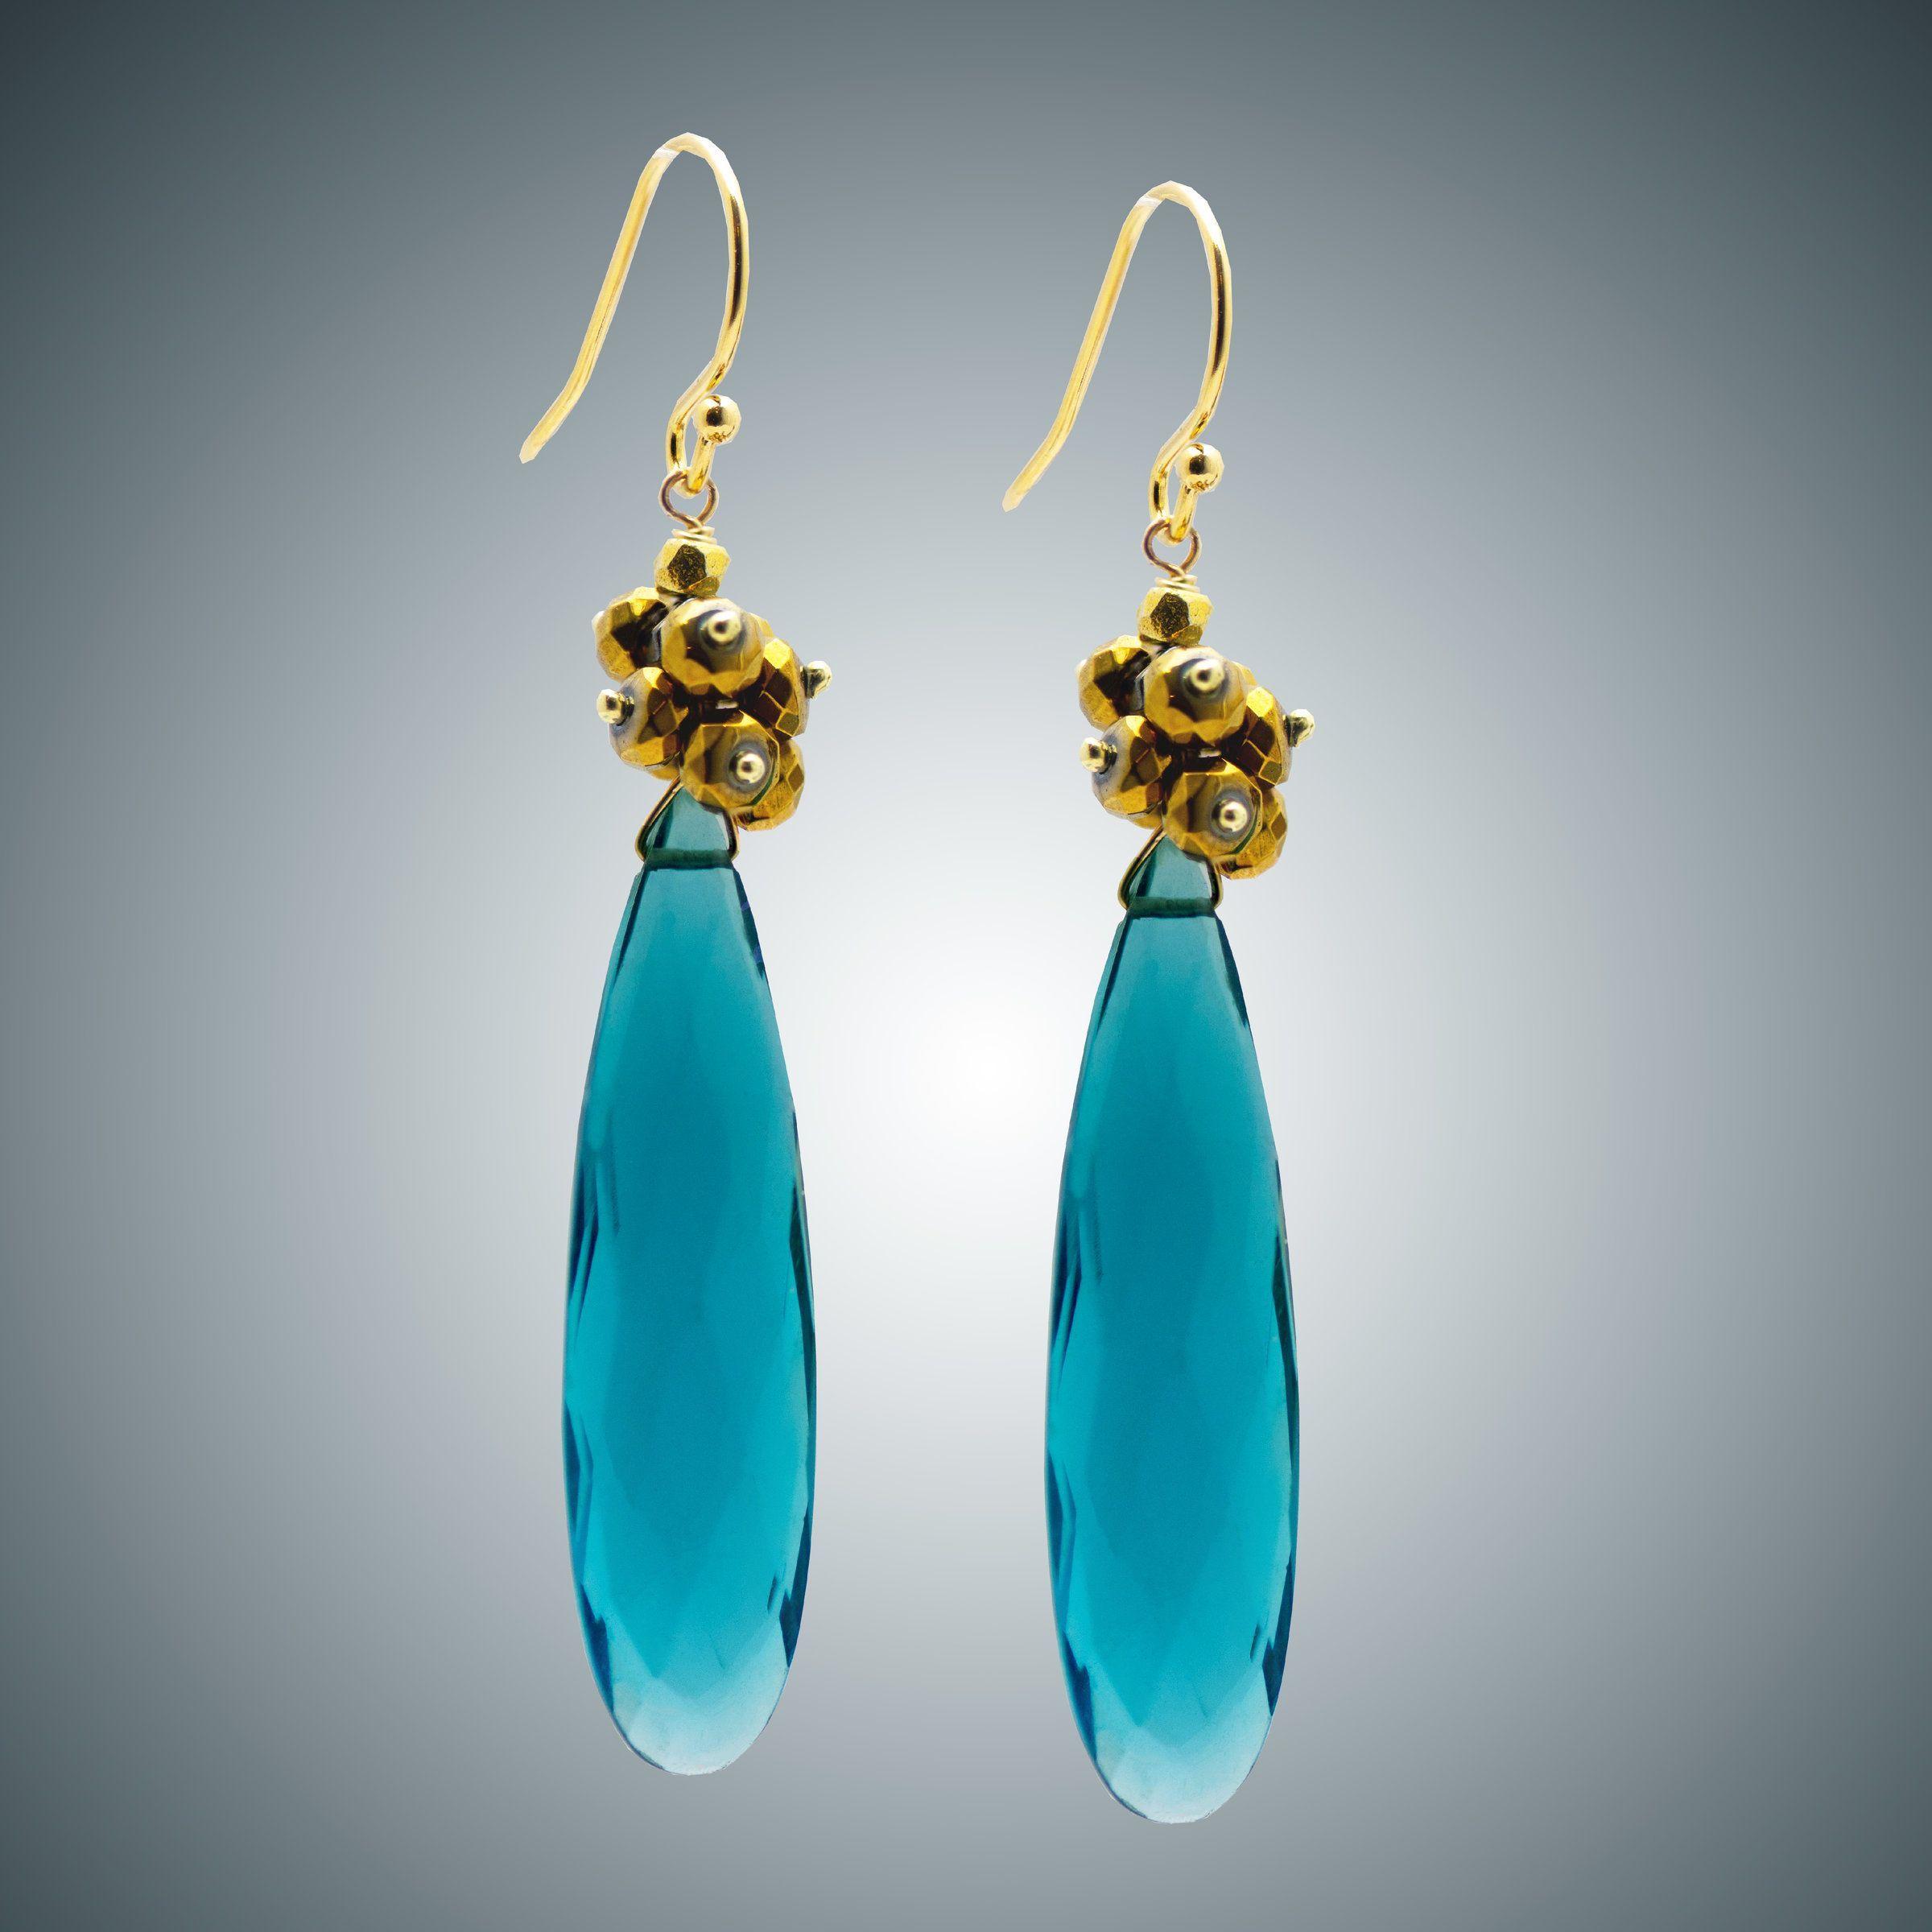 London Blue Pendant and Pyrite Earrings by Judy Bliss (Gold & Stone Earrings)   Artful Home,  #Artful #Beadedjewelryvsco #Bliss #Blue #earrings #Gold #Home #Judy #London #pendant #Pyrite #Stone